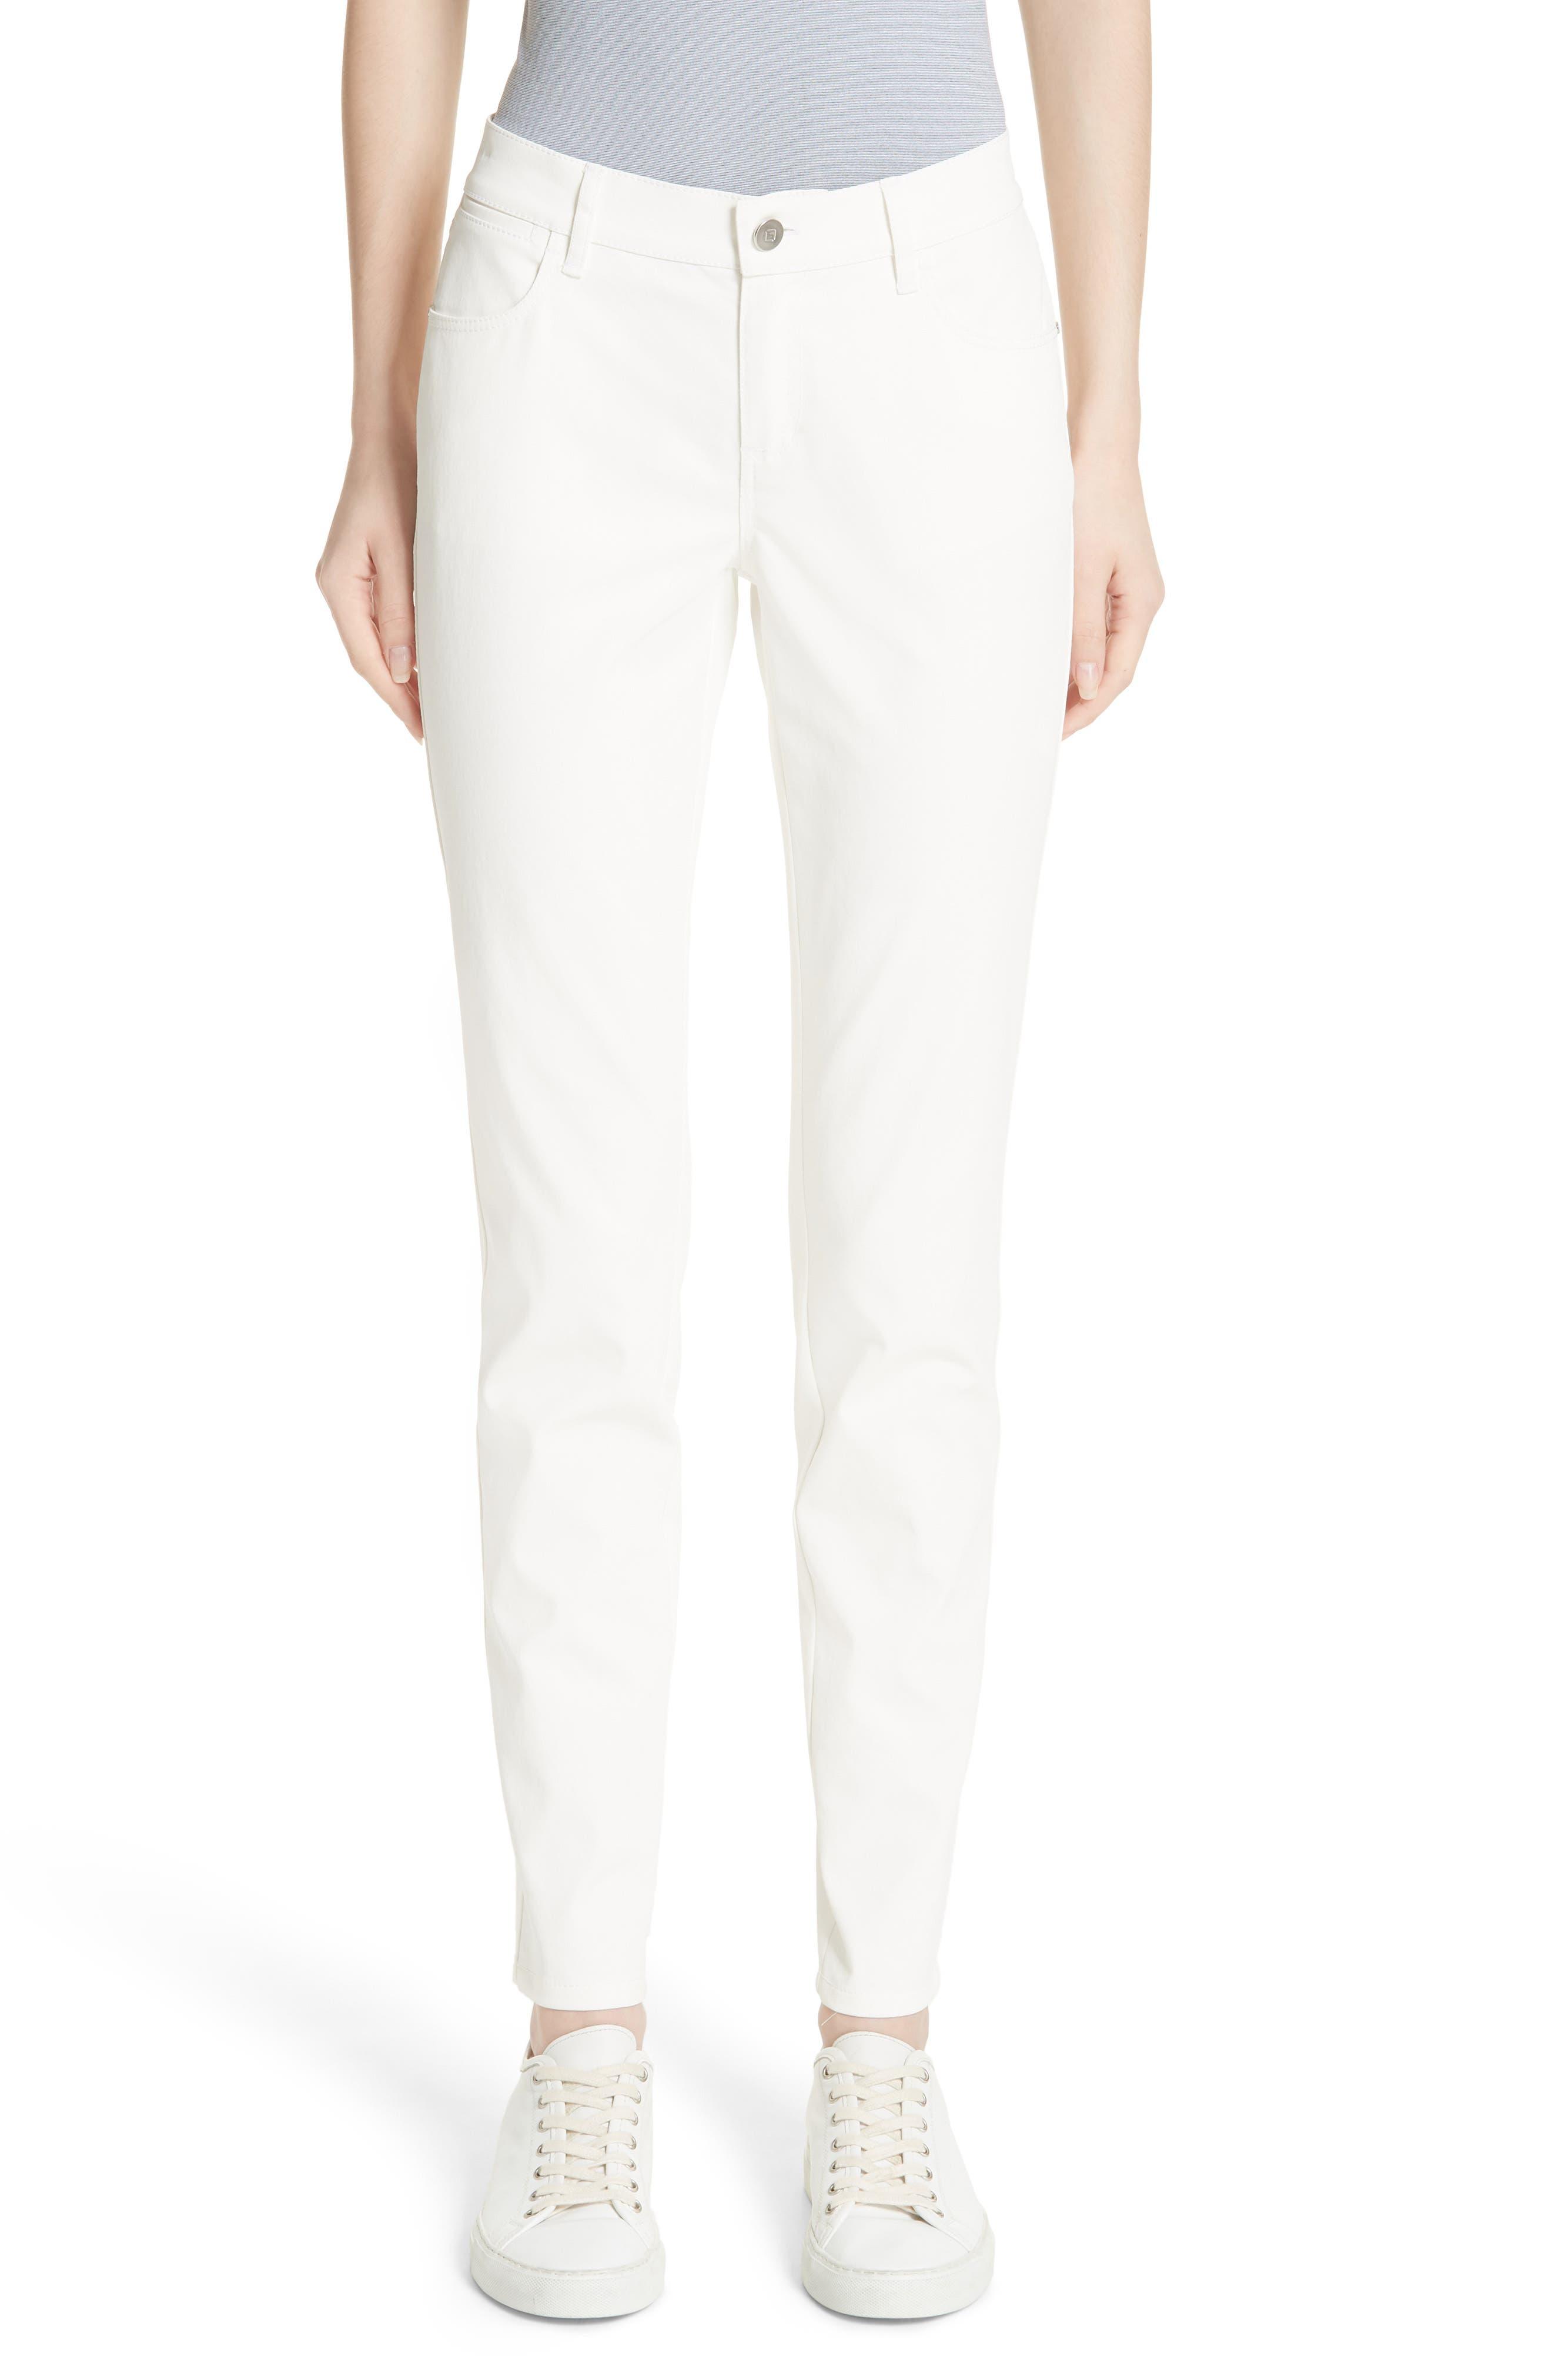 Mercer Waxed Denim Skinny Jeans in White